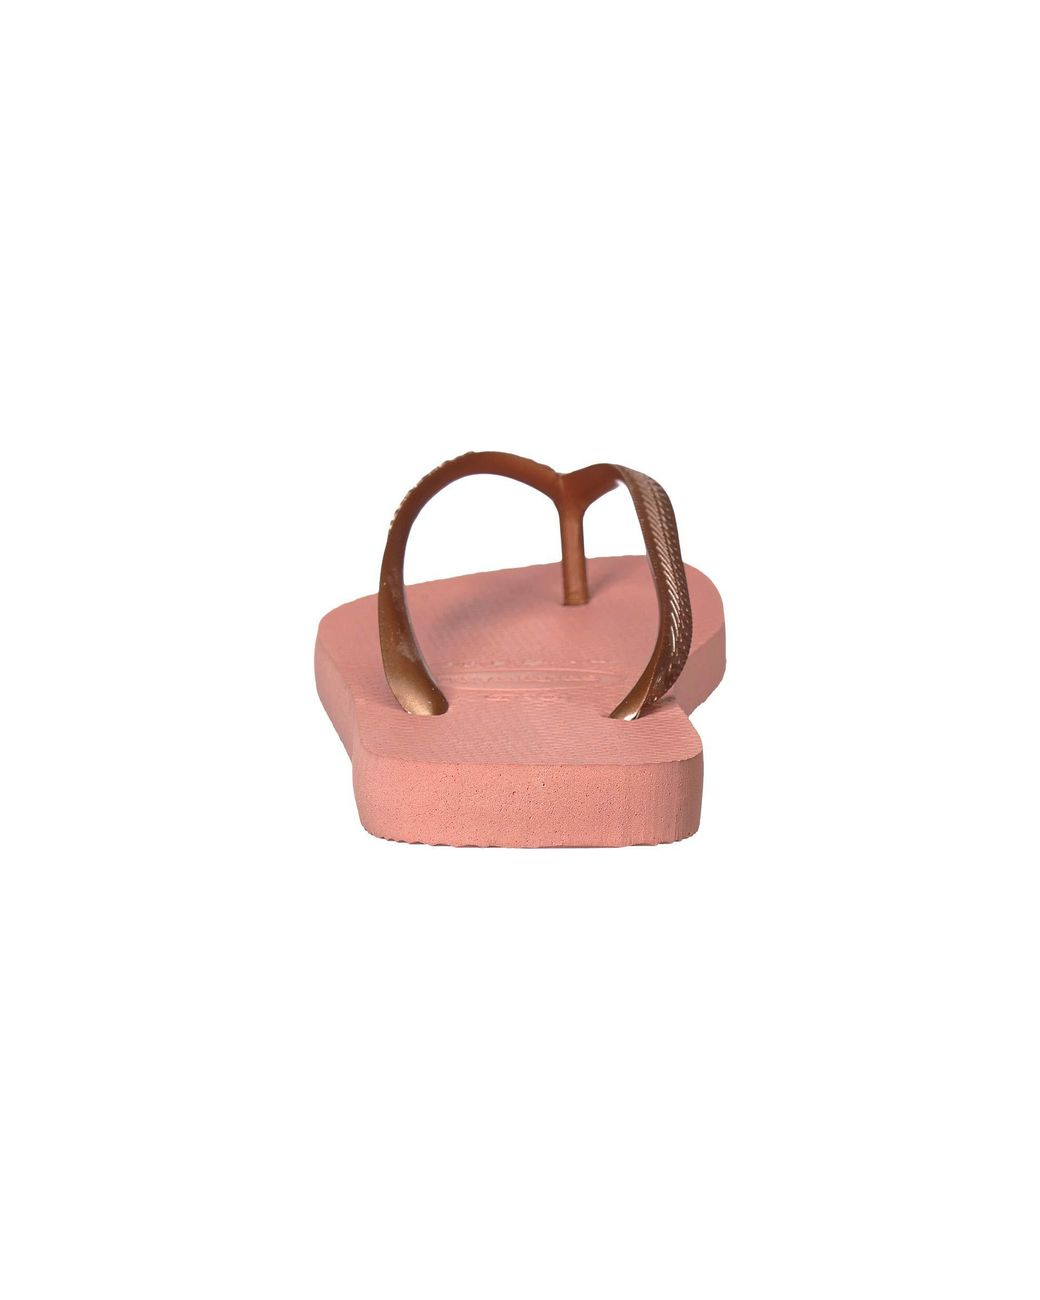 27c37804a526 Lyst - Havaianas Top Tiras Flip-flops (rose Gold) Women s Sandals in Pink